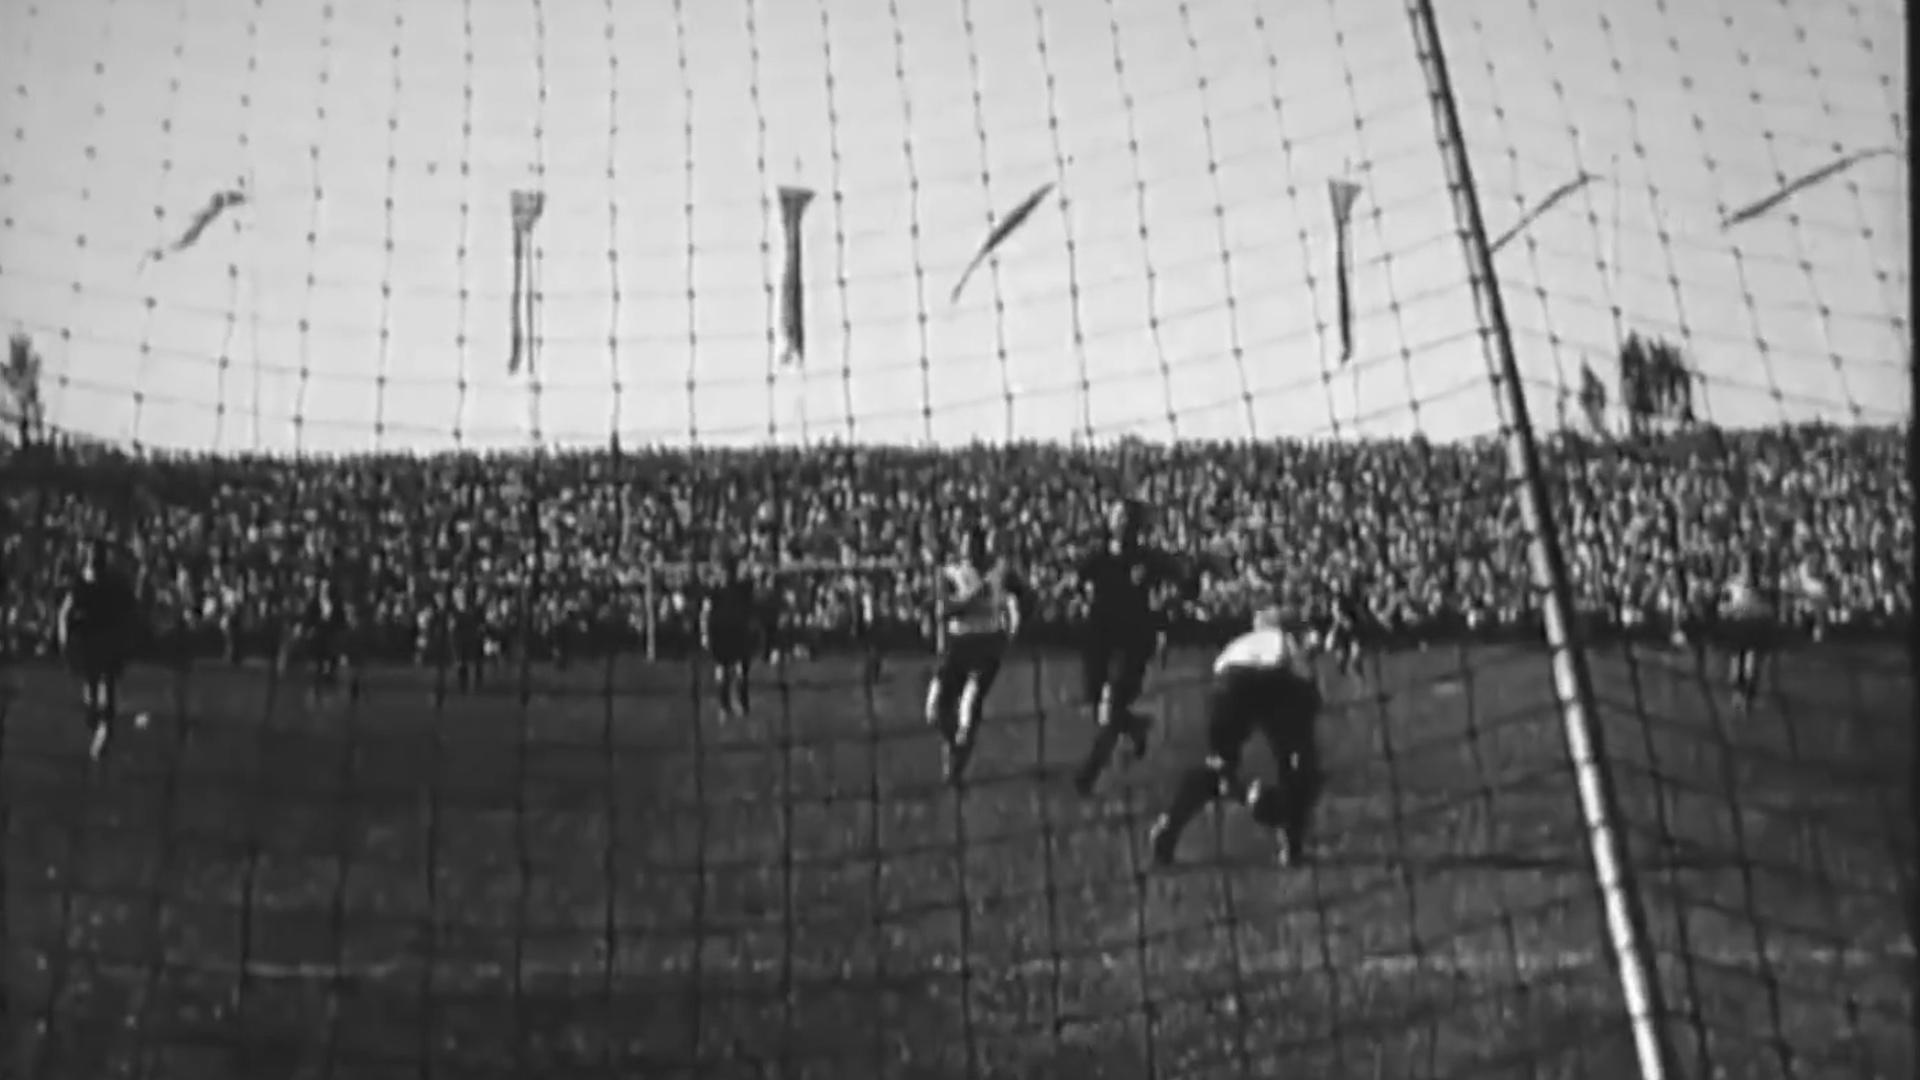 Meisterschaft 1932 mit g nther koch erfolgsfans der for Koch fc bayern